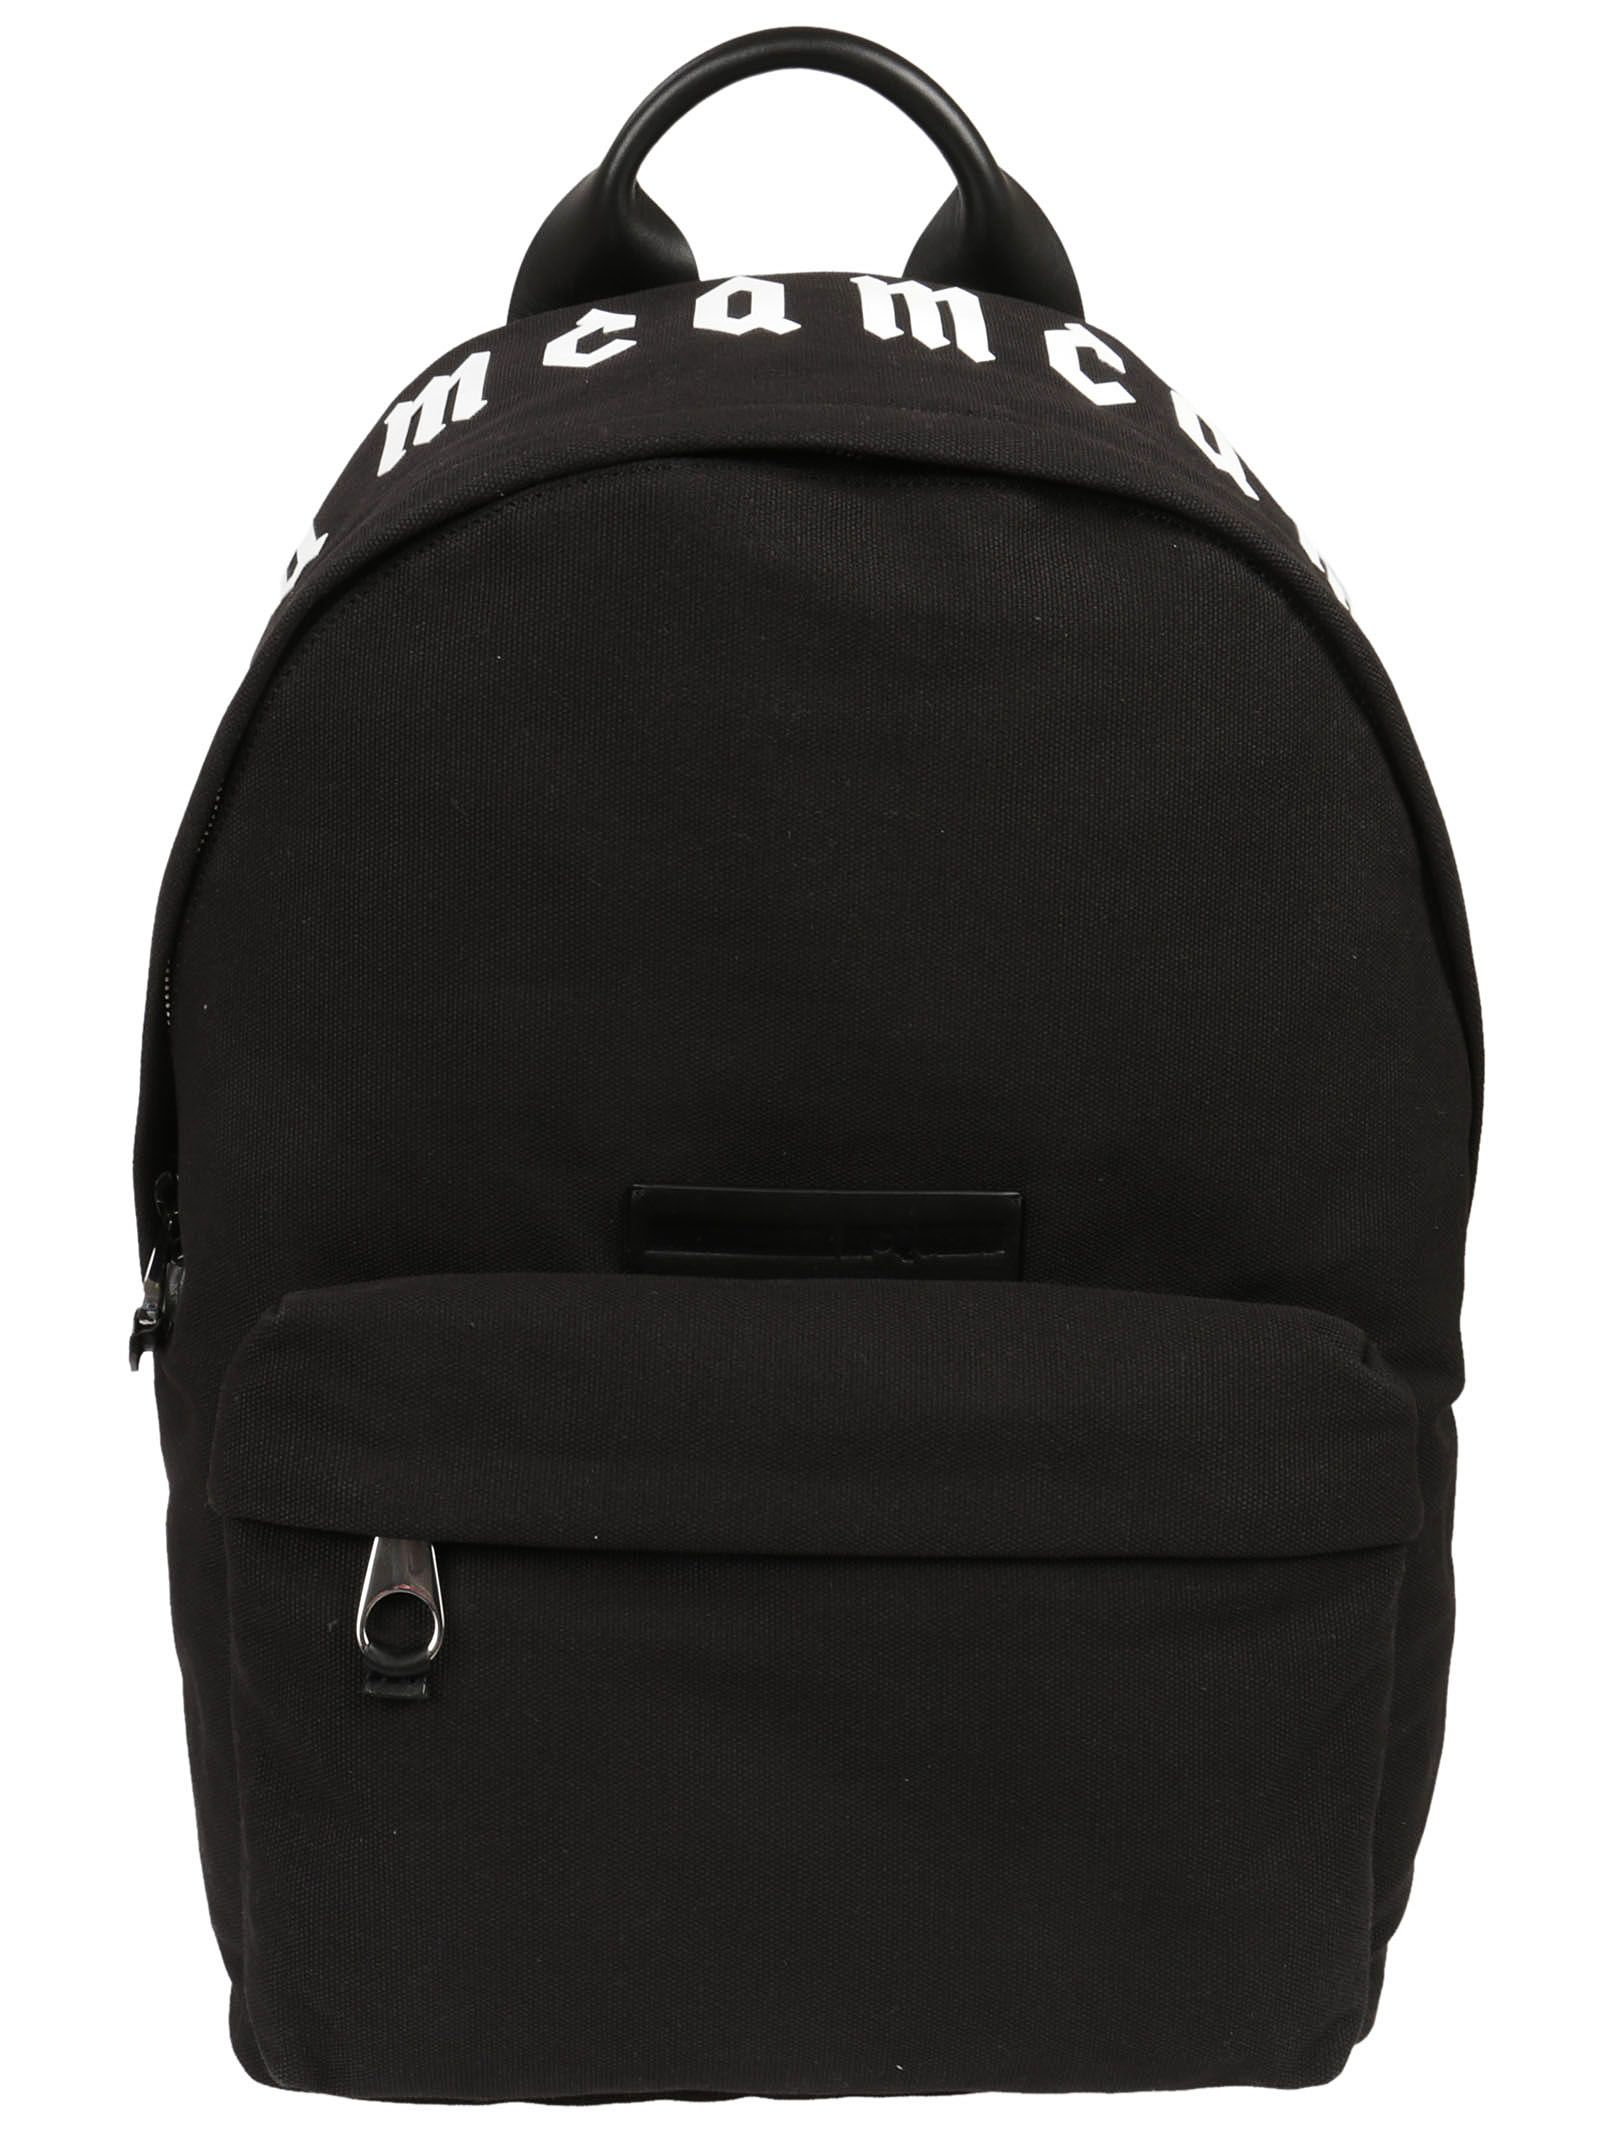 McQ Alexander McQueen Alexander Ueen Logo Backpack